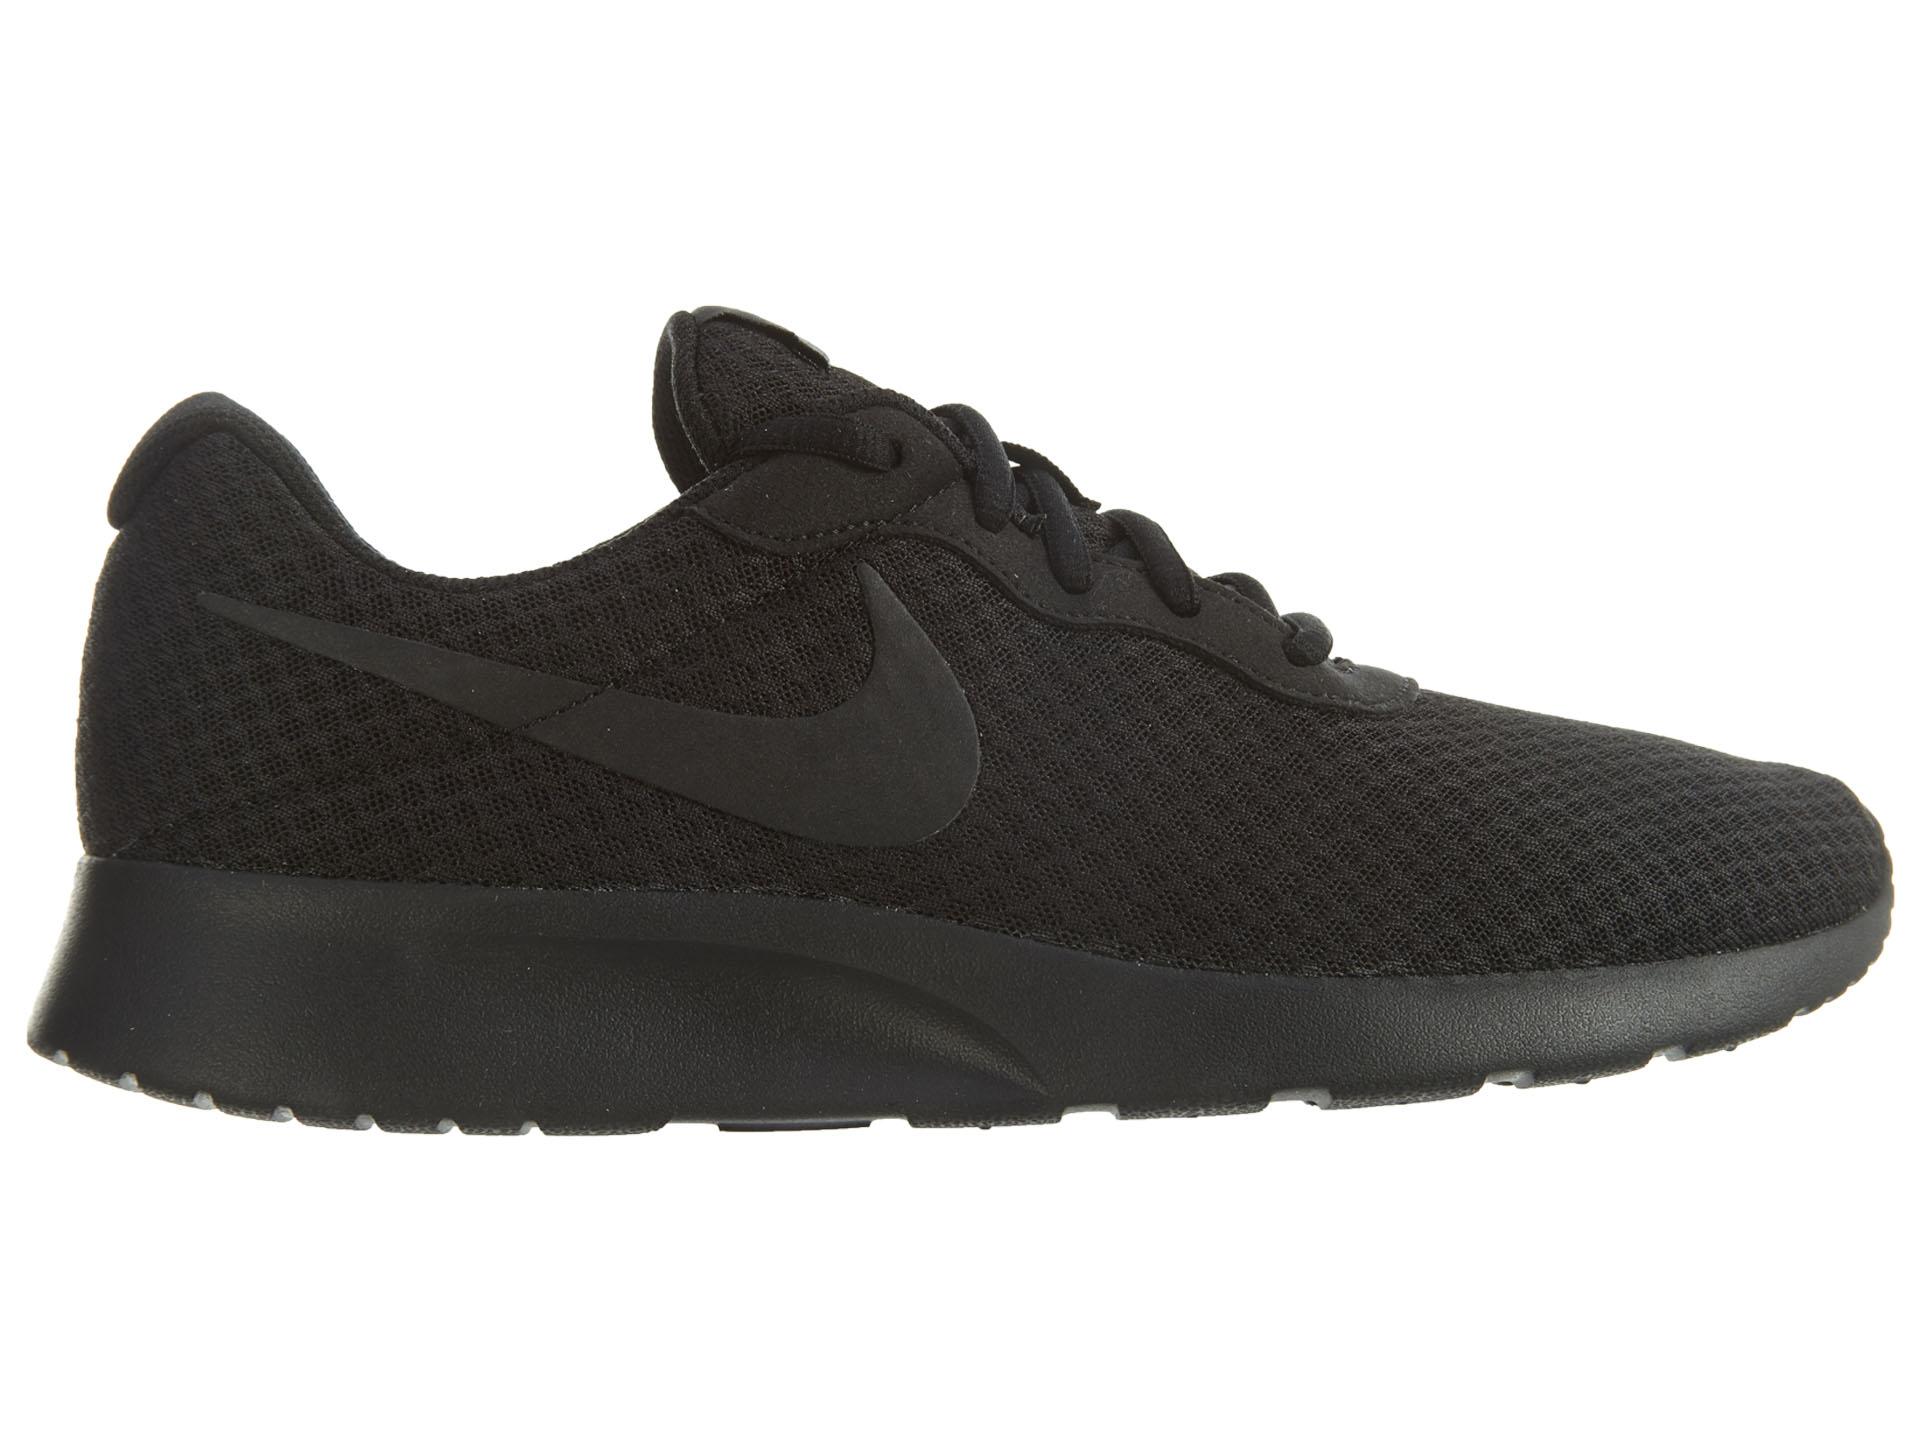 new styles 98608 6e1a6 free shipping nike tanjun sneakers svart hvit sportamore.no ac5af 04472   new arrivals nike tanjun black black anthracite 812654 001 546ad 5b56a